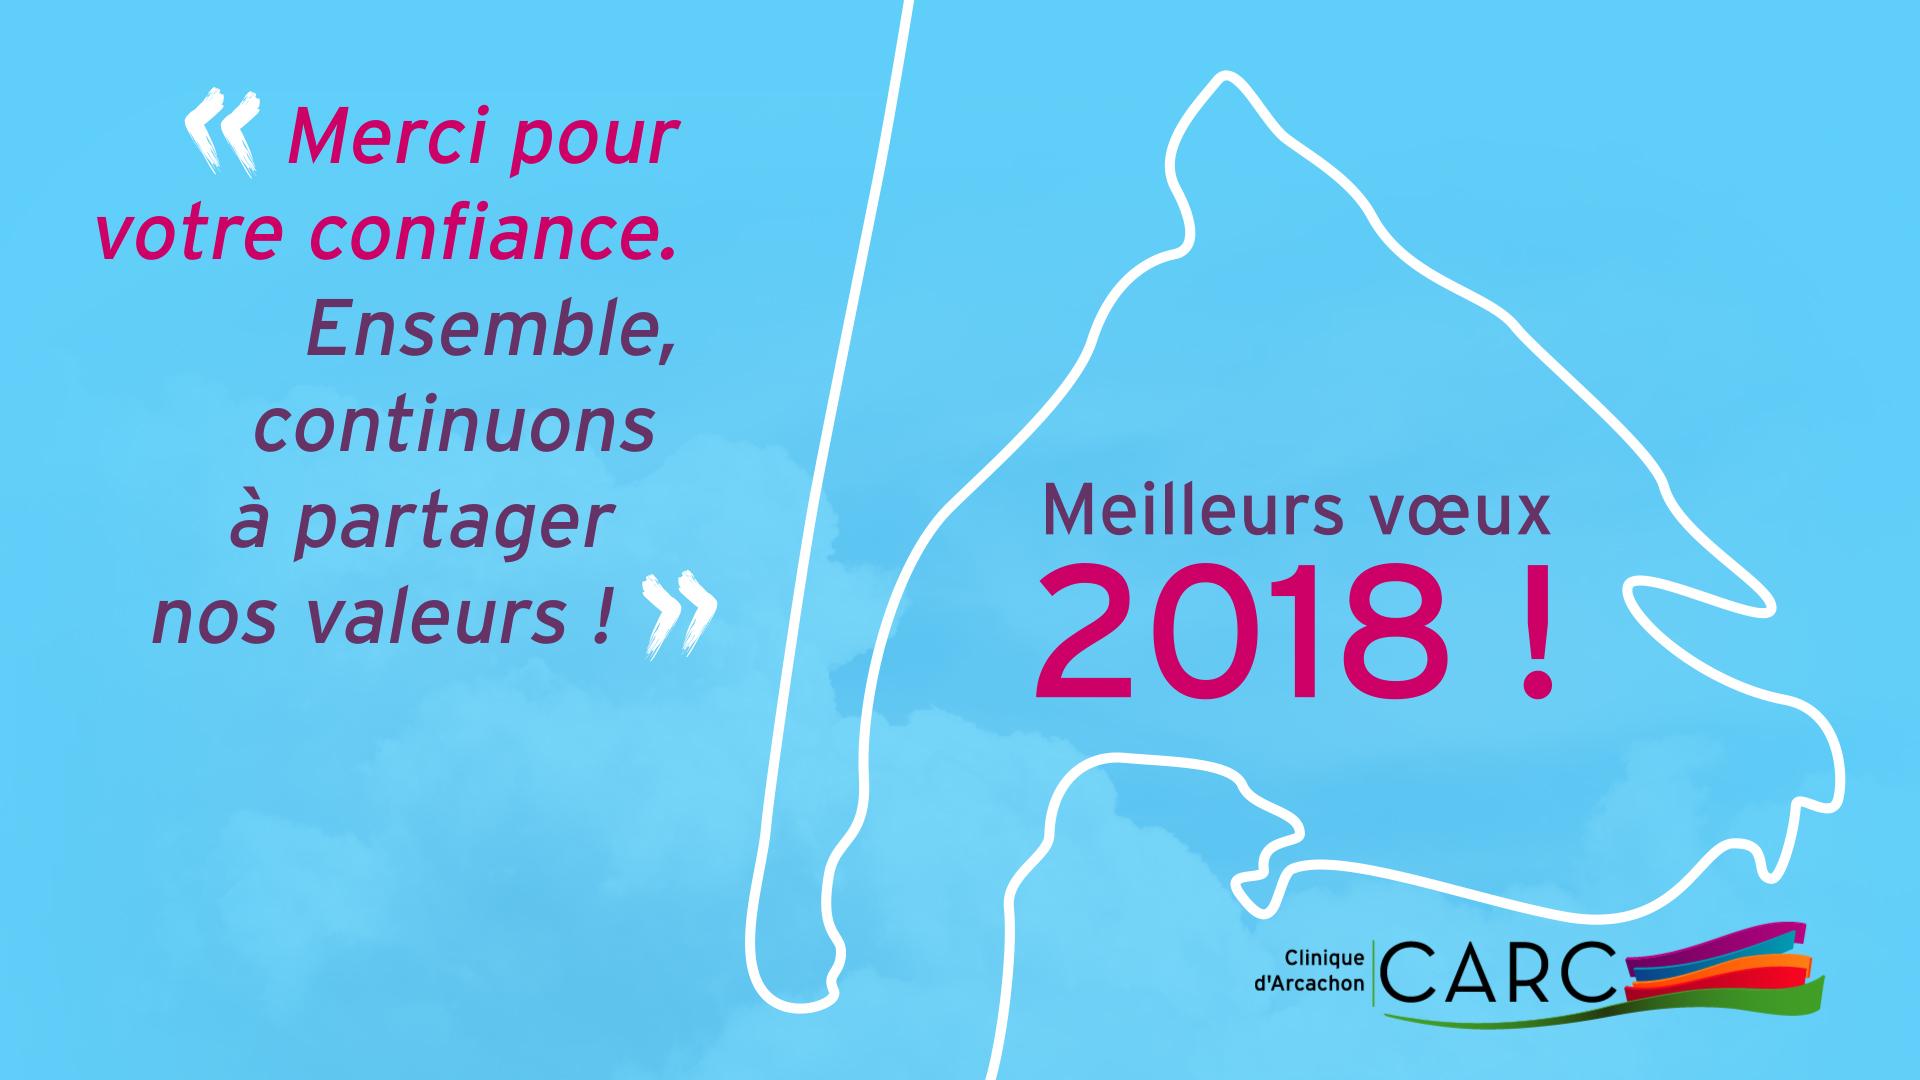 Clinique d'Arcachon – Vœux 2018